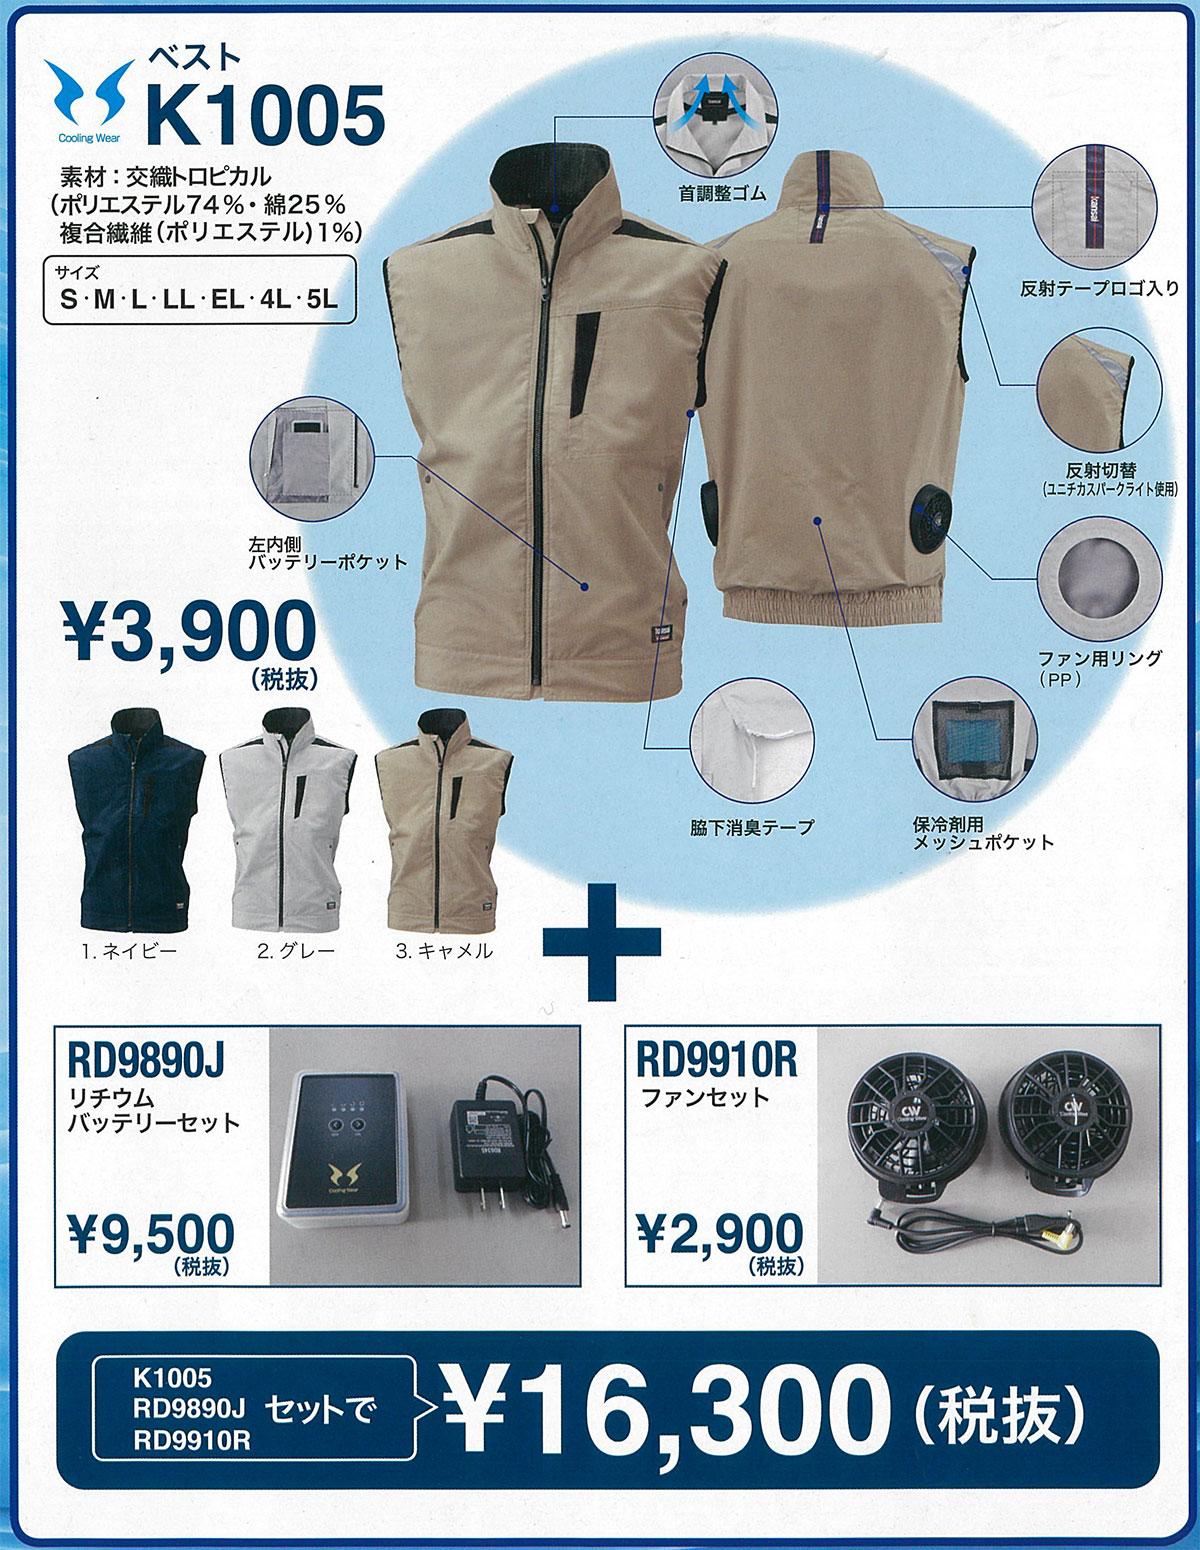 Kansaix空調風神服K1005空調服セットの詳細